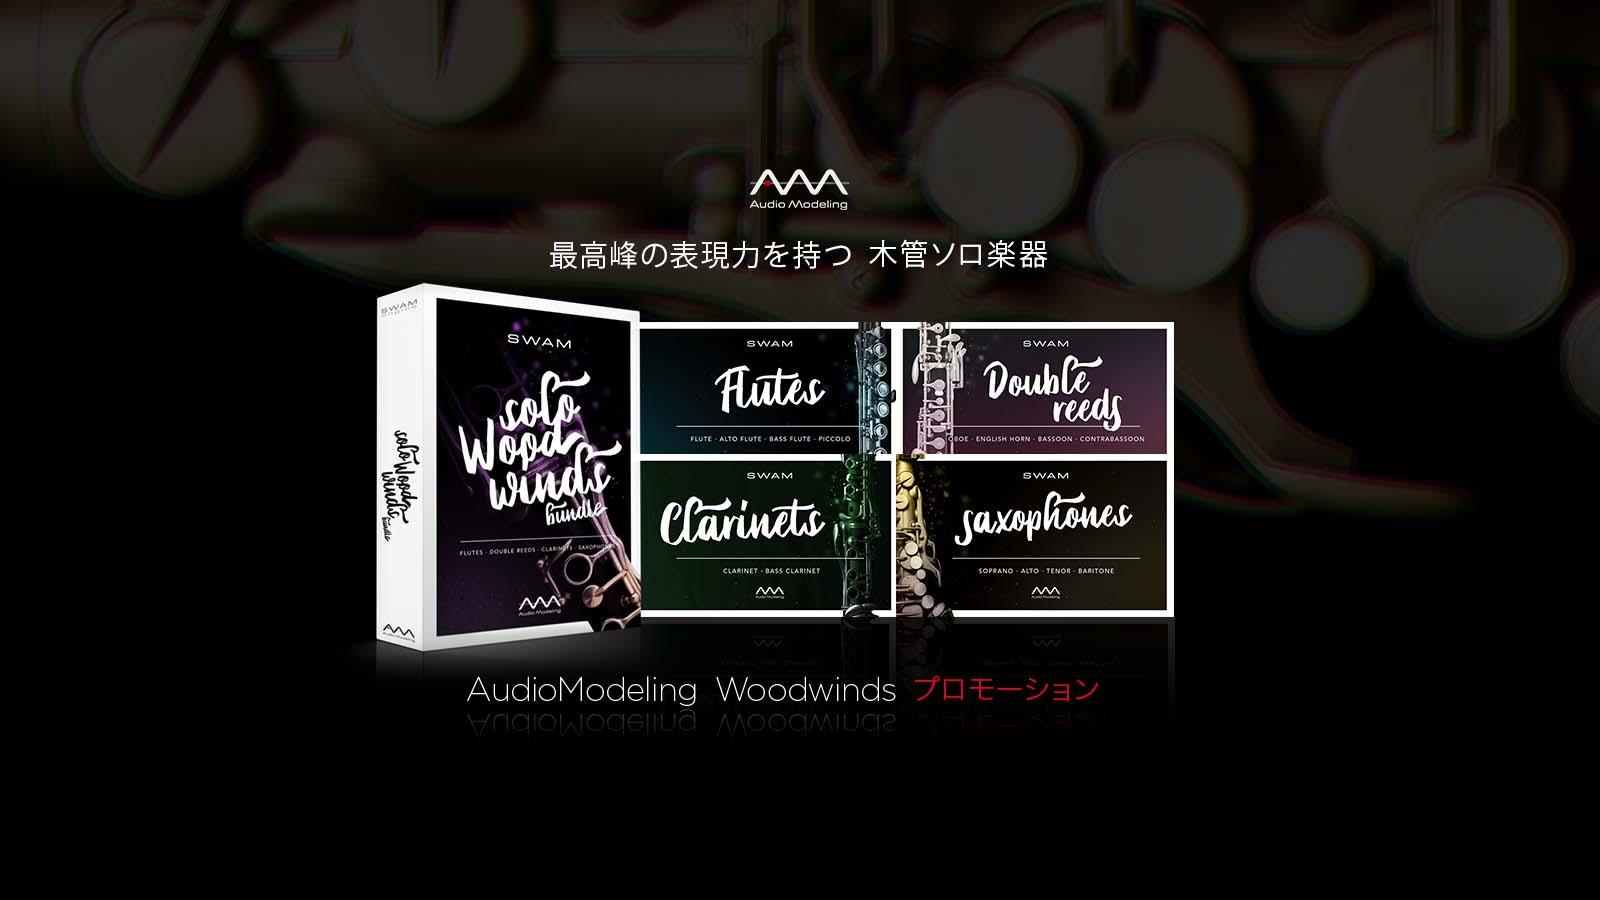 Audio Modeling Woodwinds プロモーション